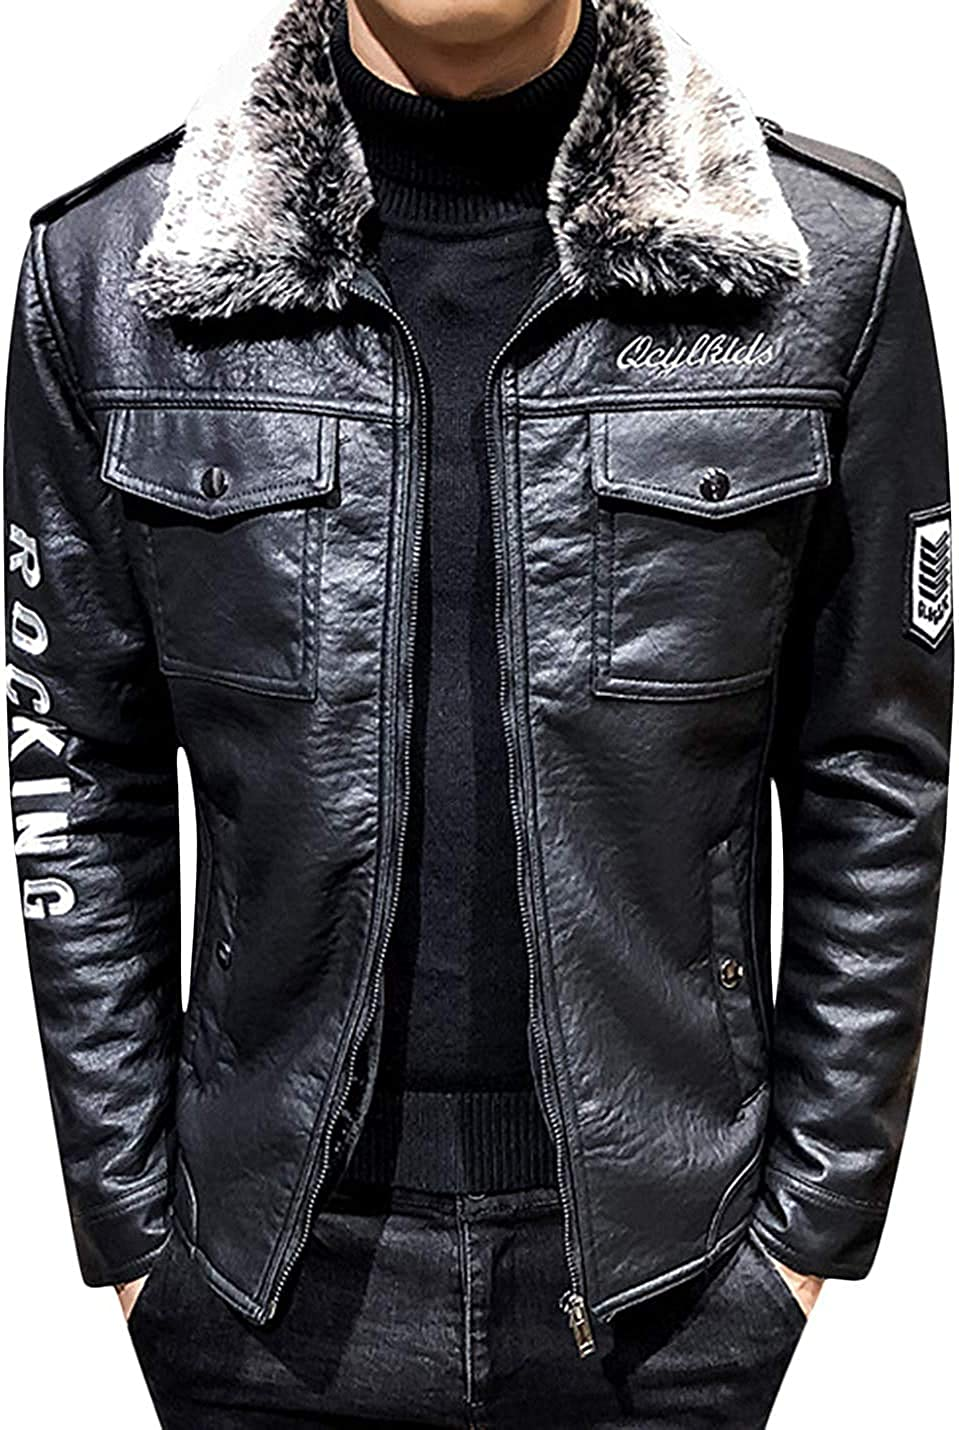 Qhghdgysd Mens Full Zipper Fur Collar Sherpa Lined Faux Leather Coat Jacket